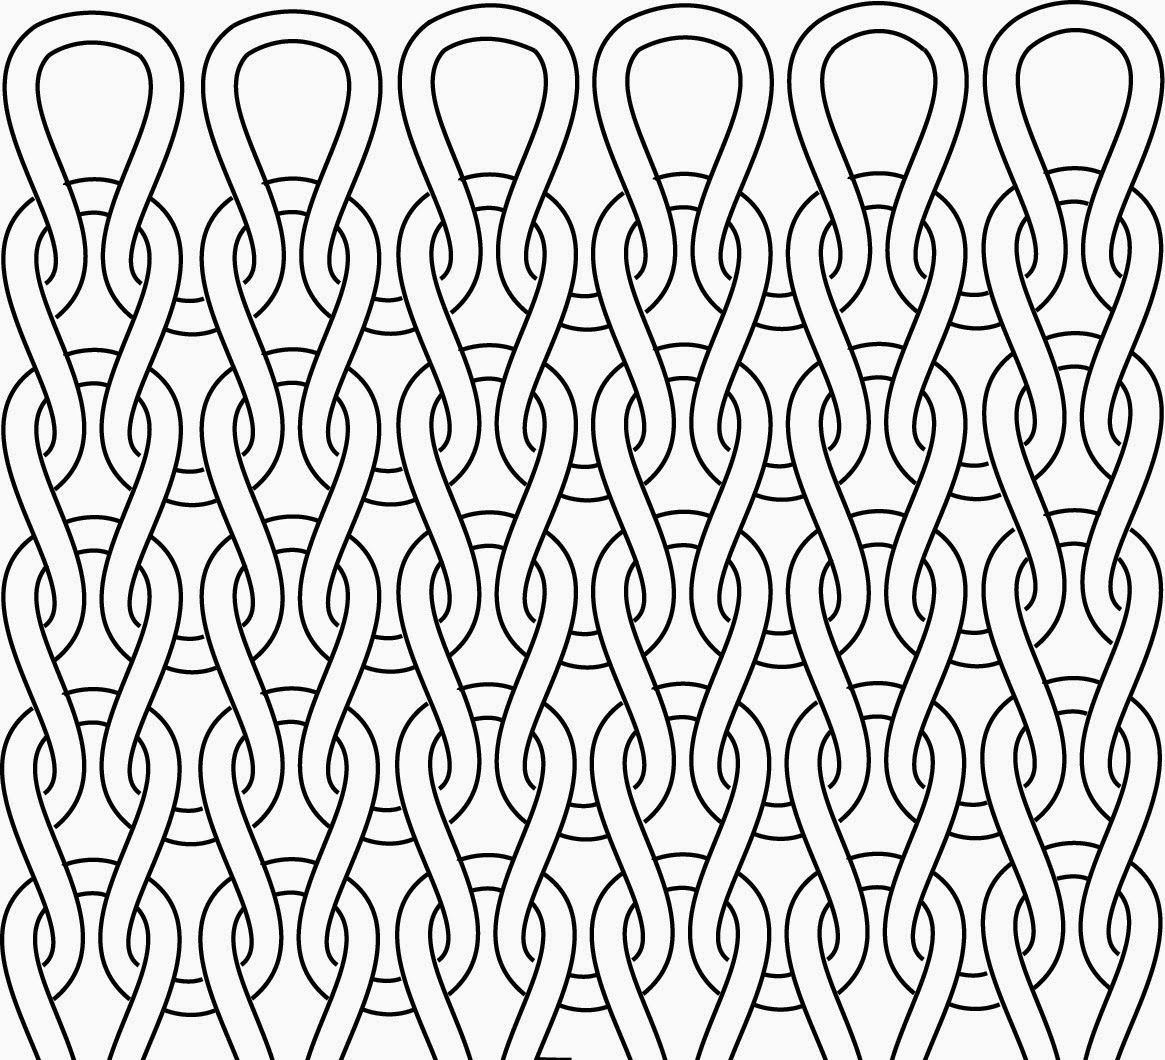 Stockinette+Stitch.tif (1165×1060) | Knitting | Pinterest ...